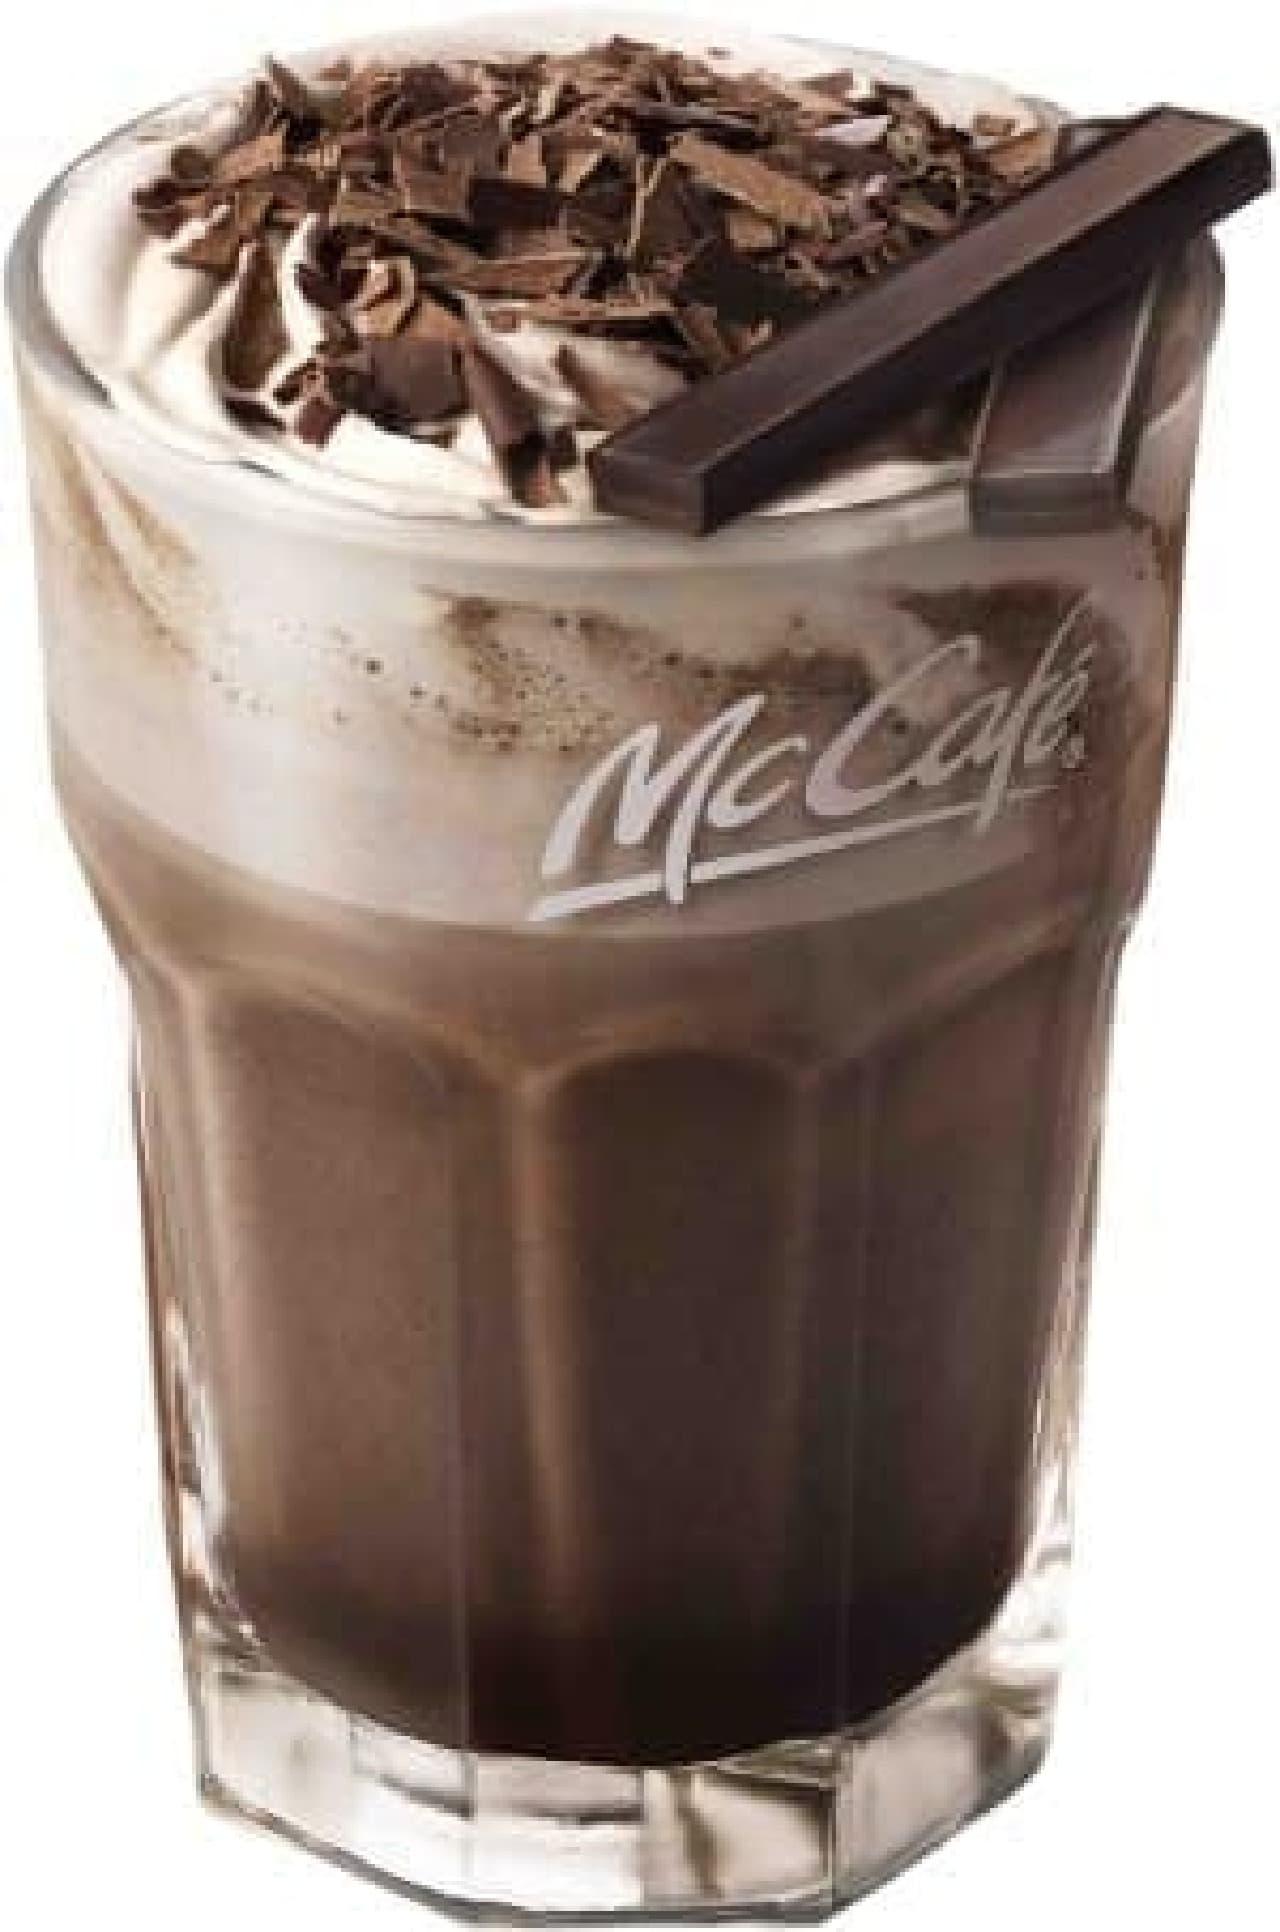 McCafe by Barista「プレミアムホットチョコレート」